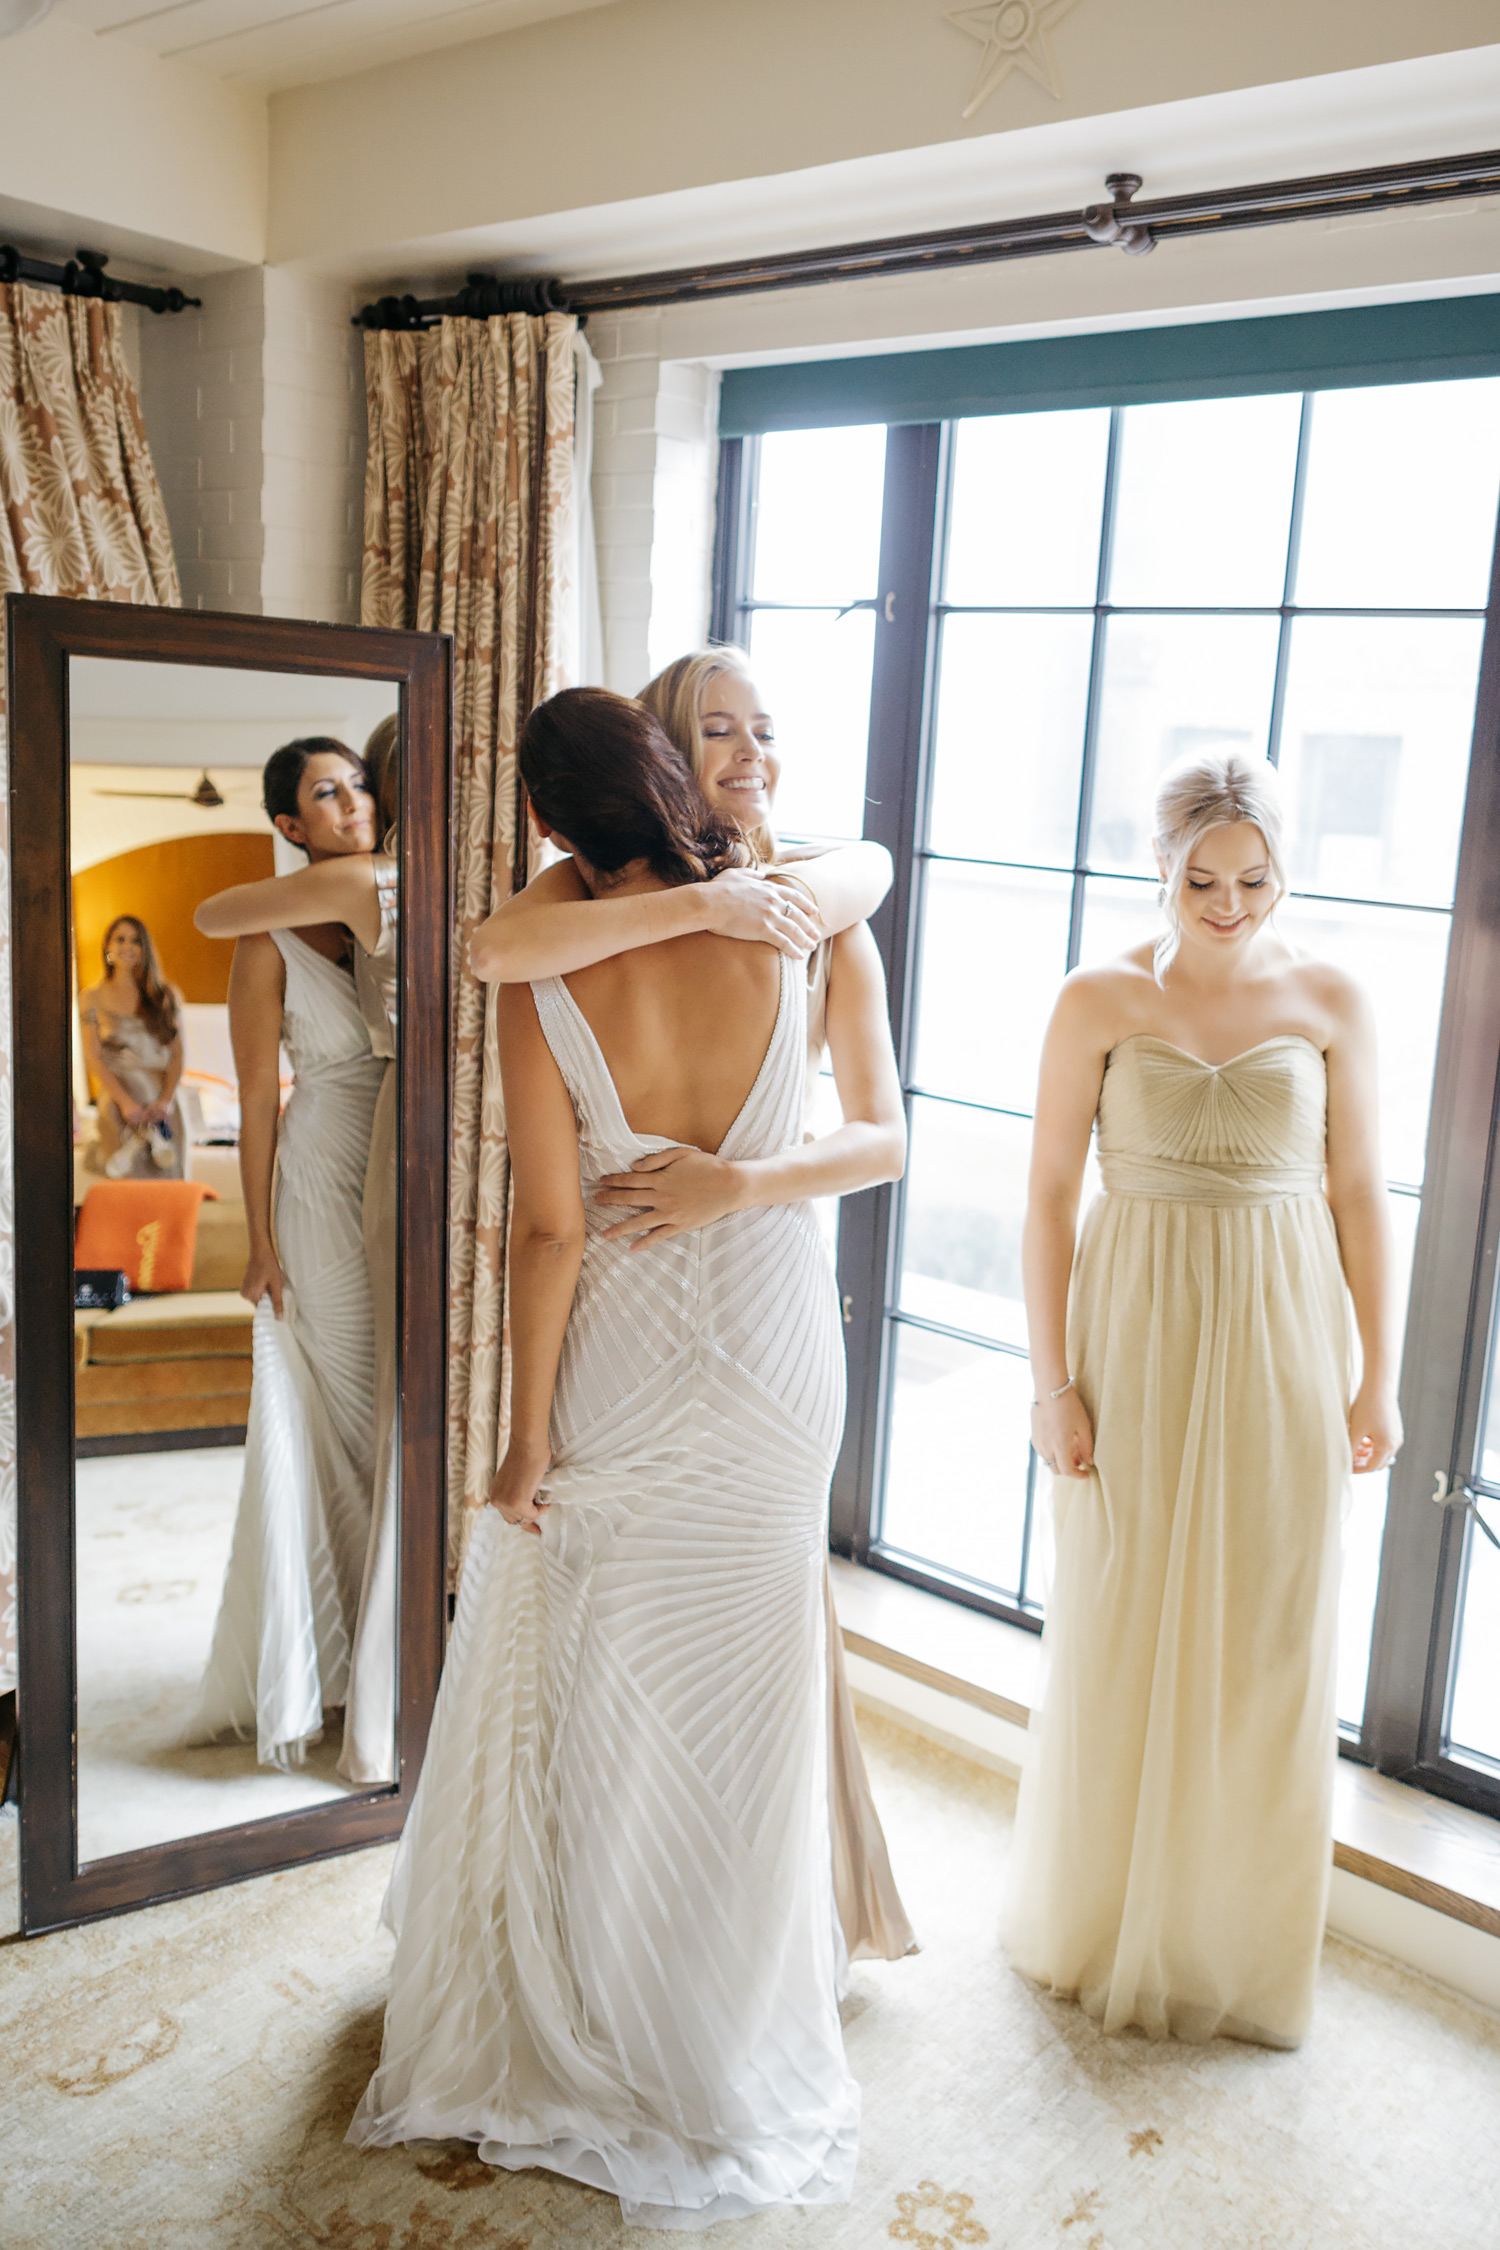 0013_bowery hotel wedding photography.JPG